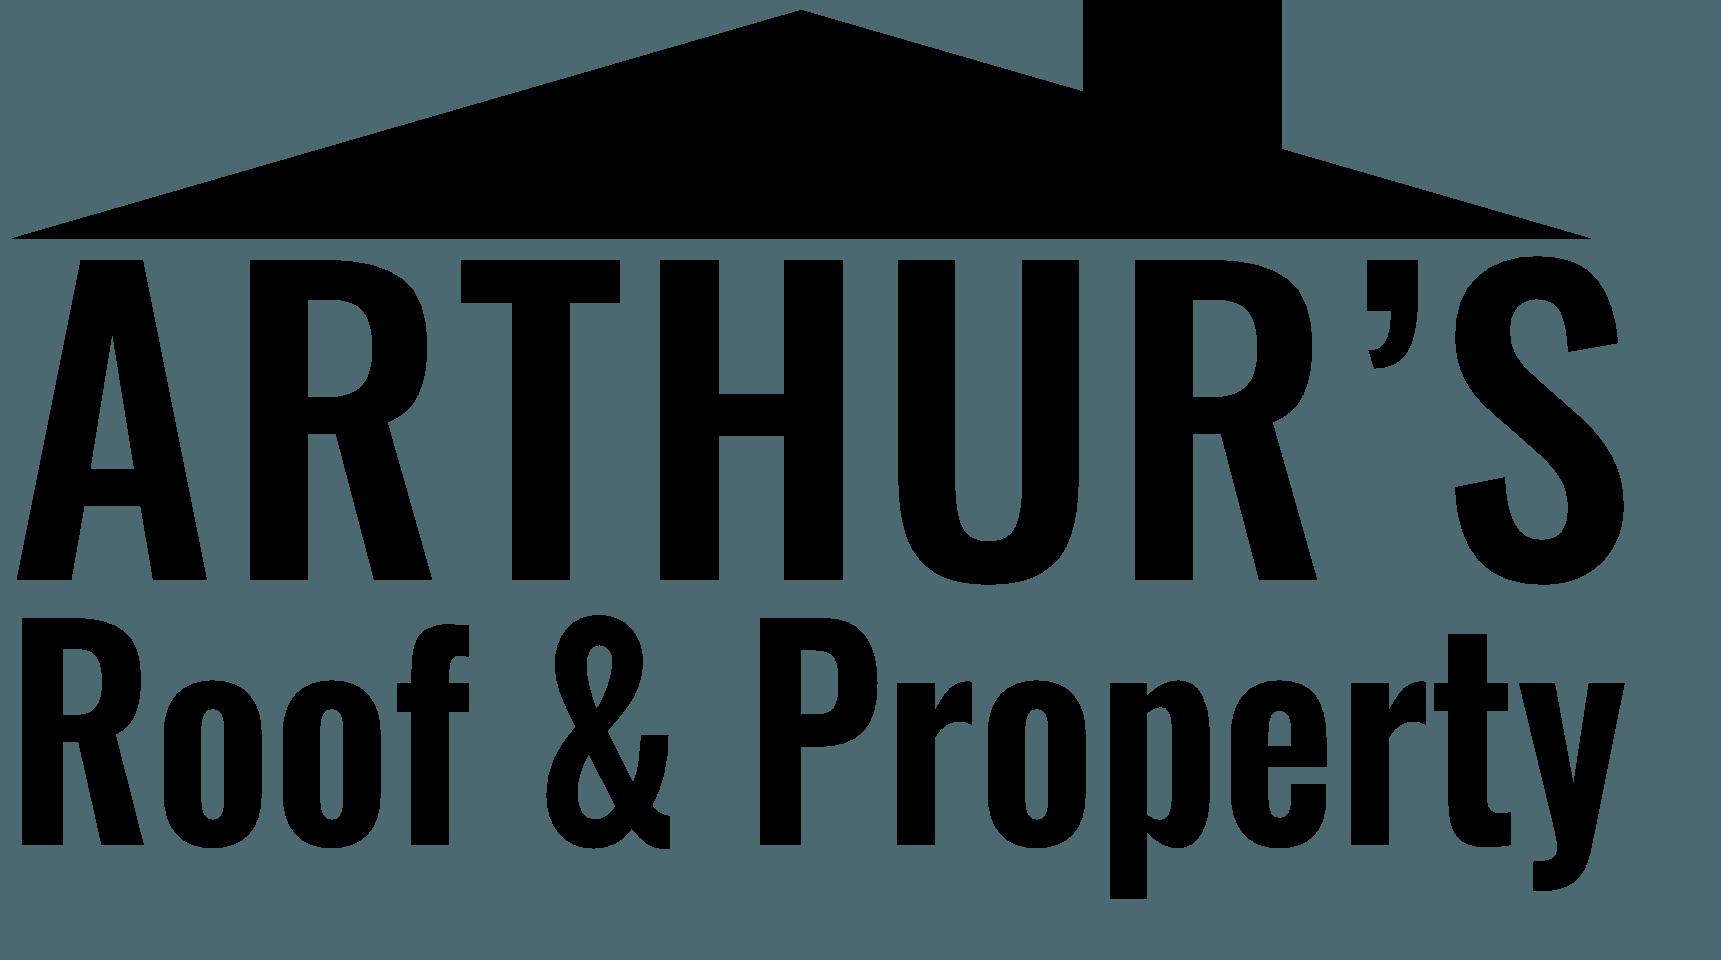 Arthurs Roof & Property